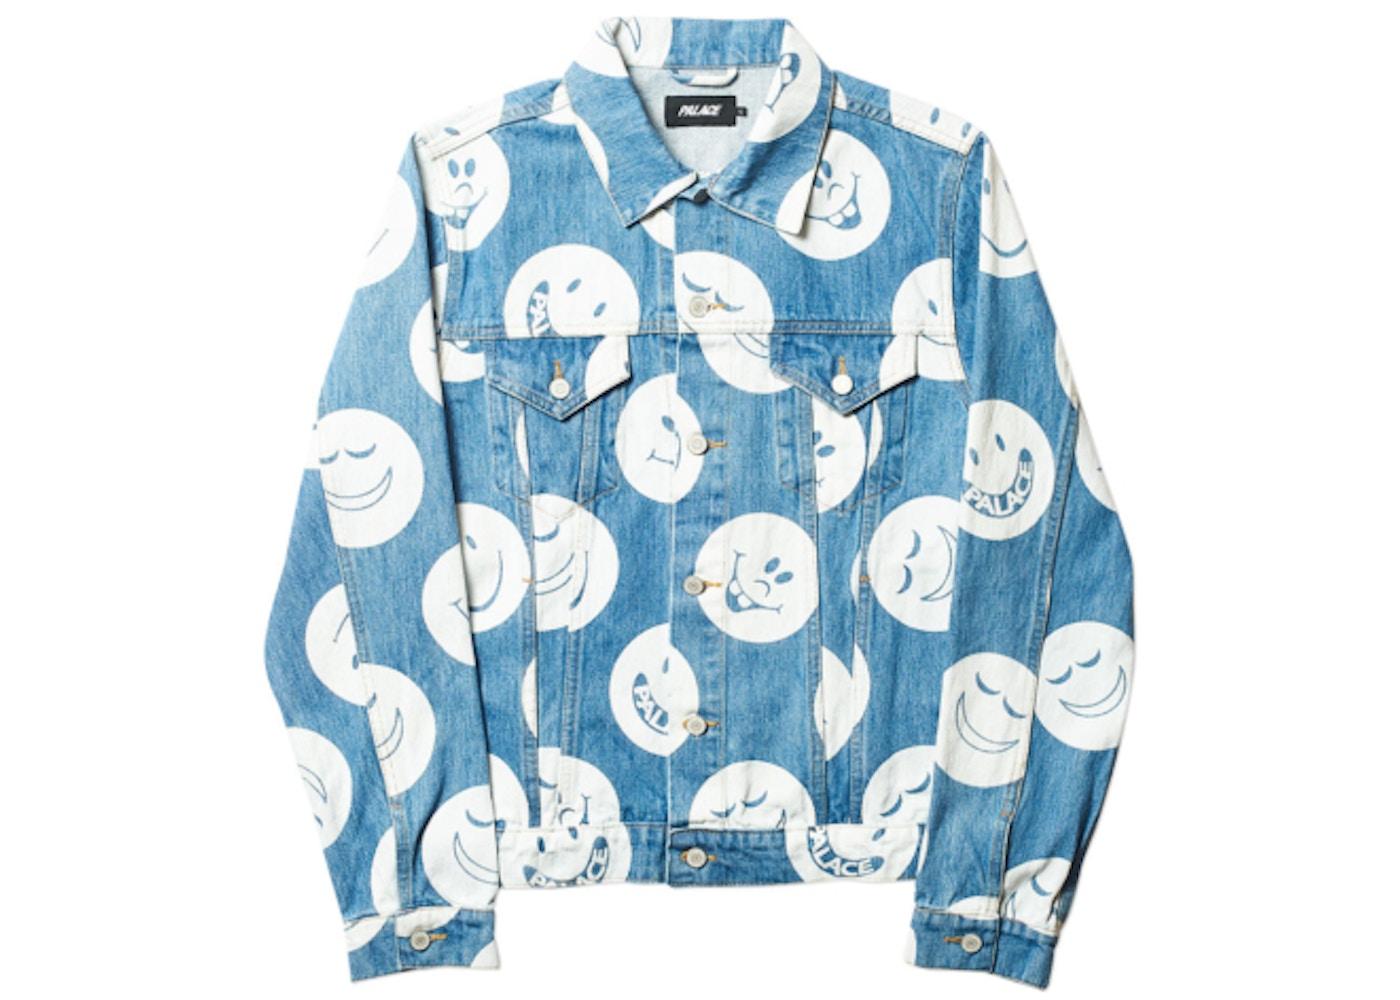 820cc3e83 Streetwear - Palace Jackets - Price Premium